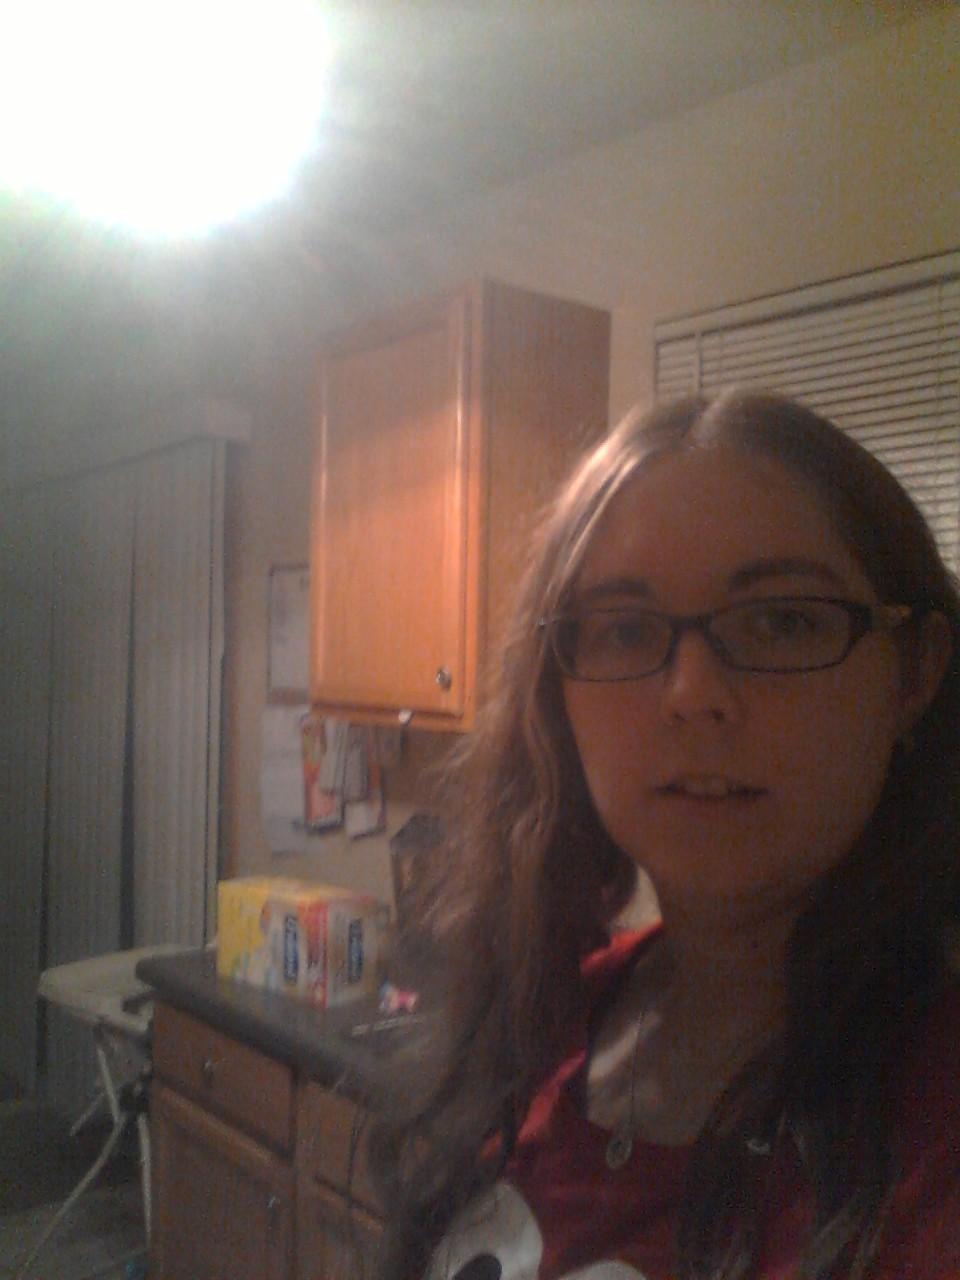 Where Can I Get Fake Glasses Near Me